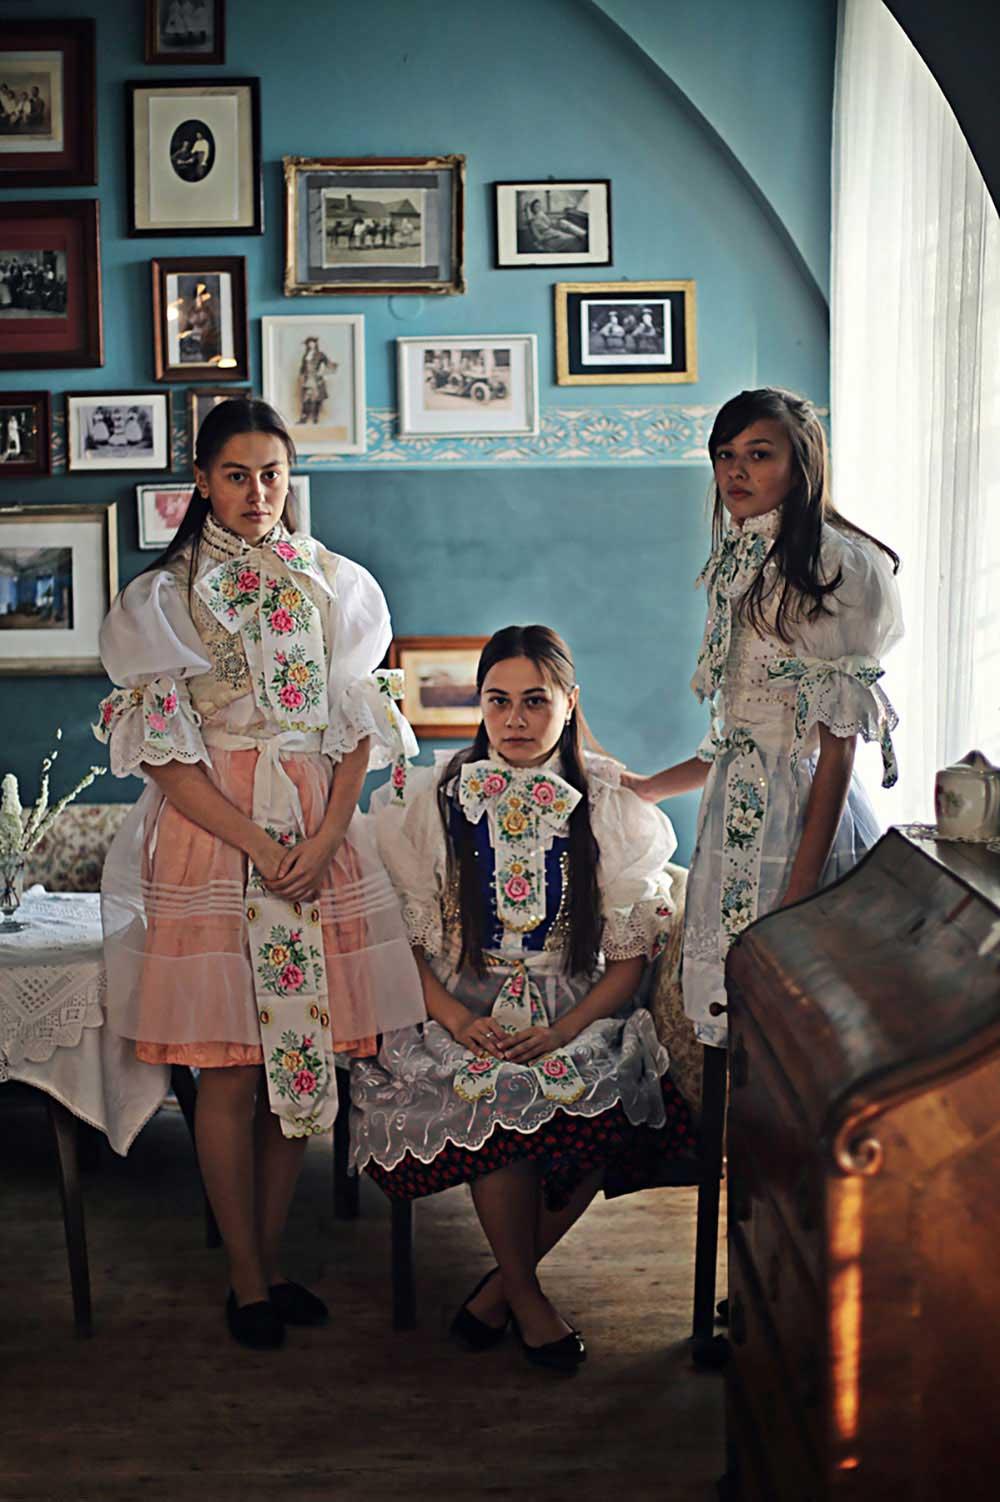 Slovakia Traditional Dresses | Zuzu Valla